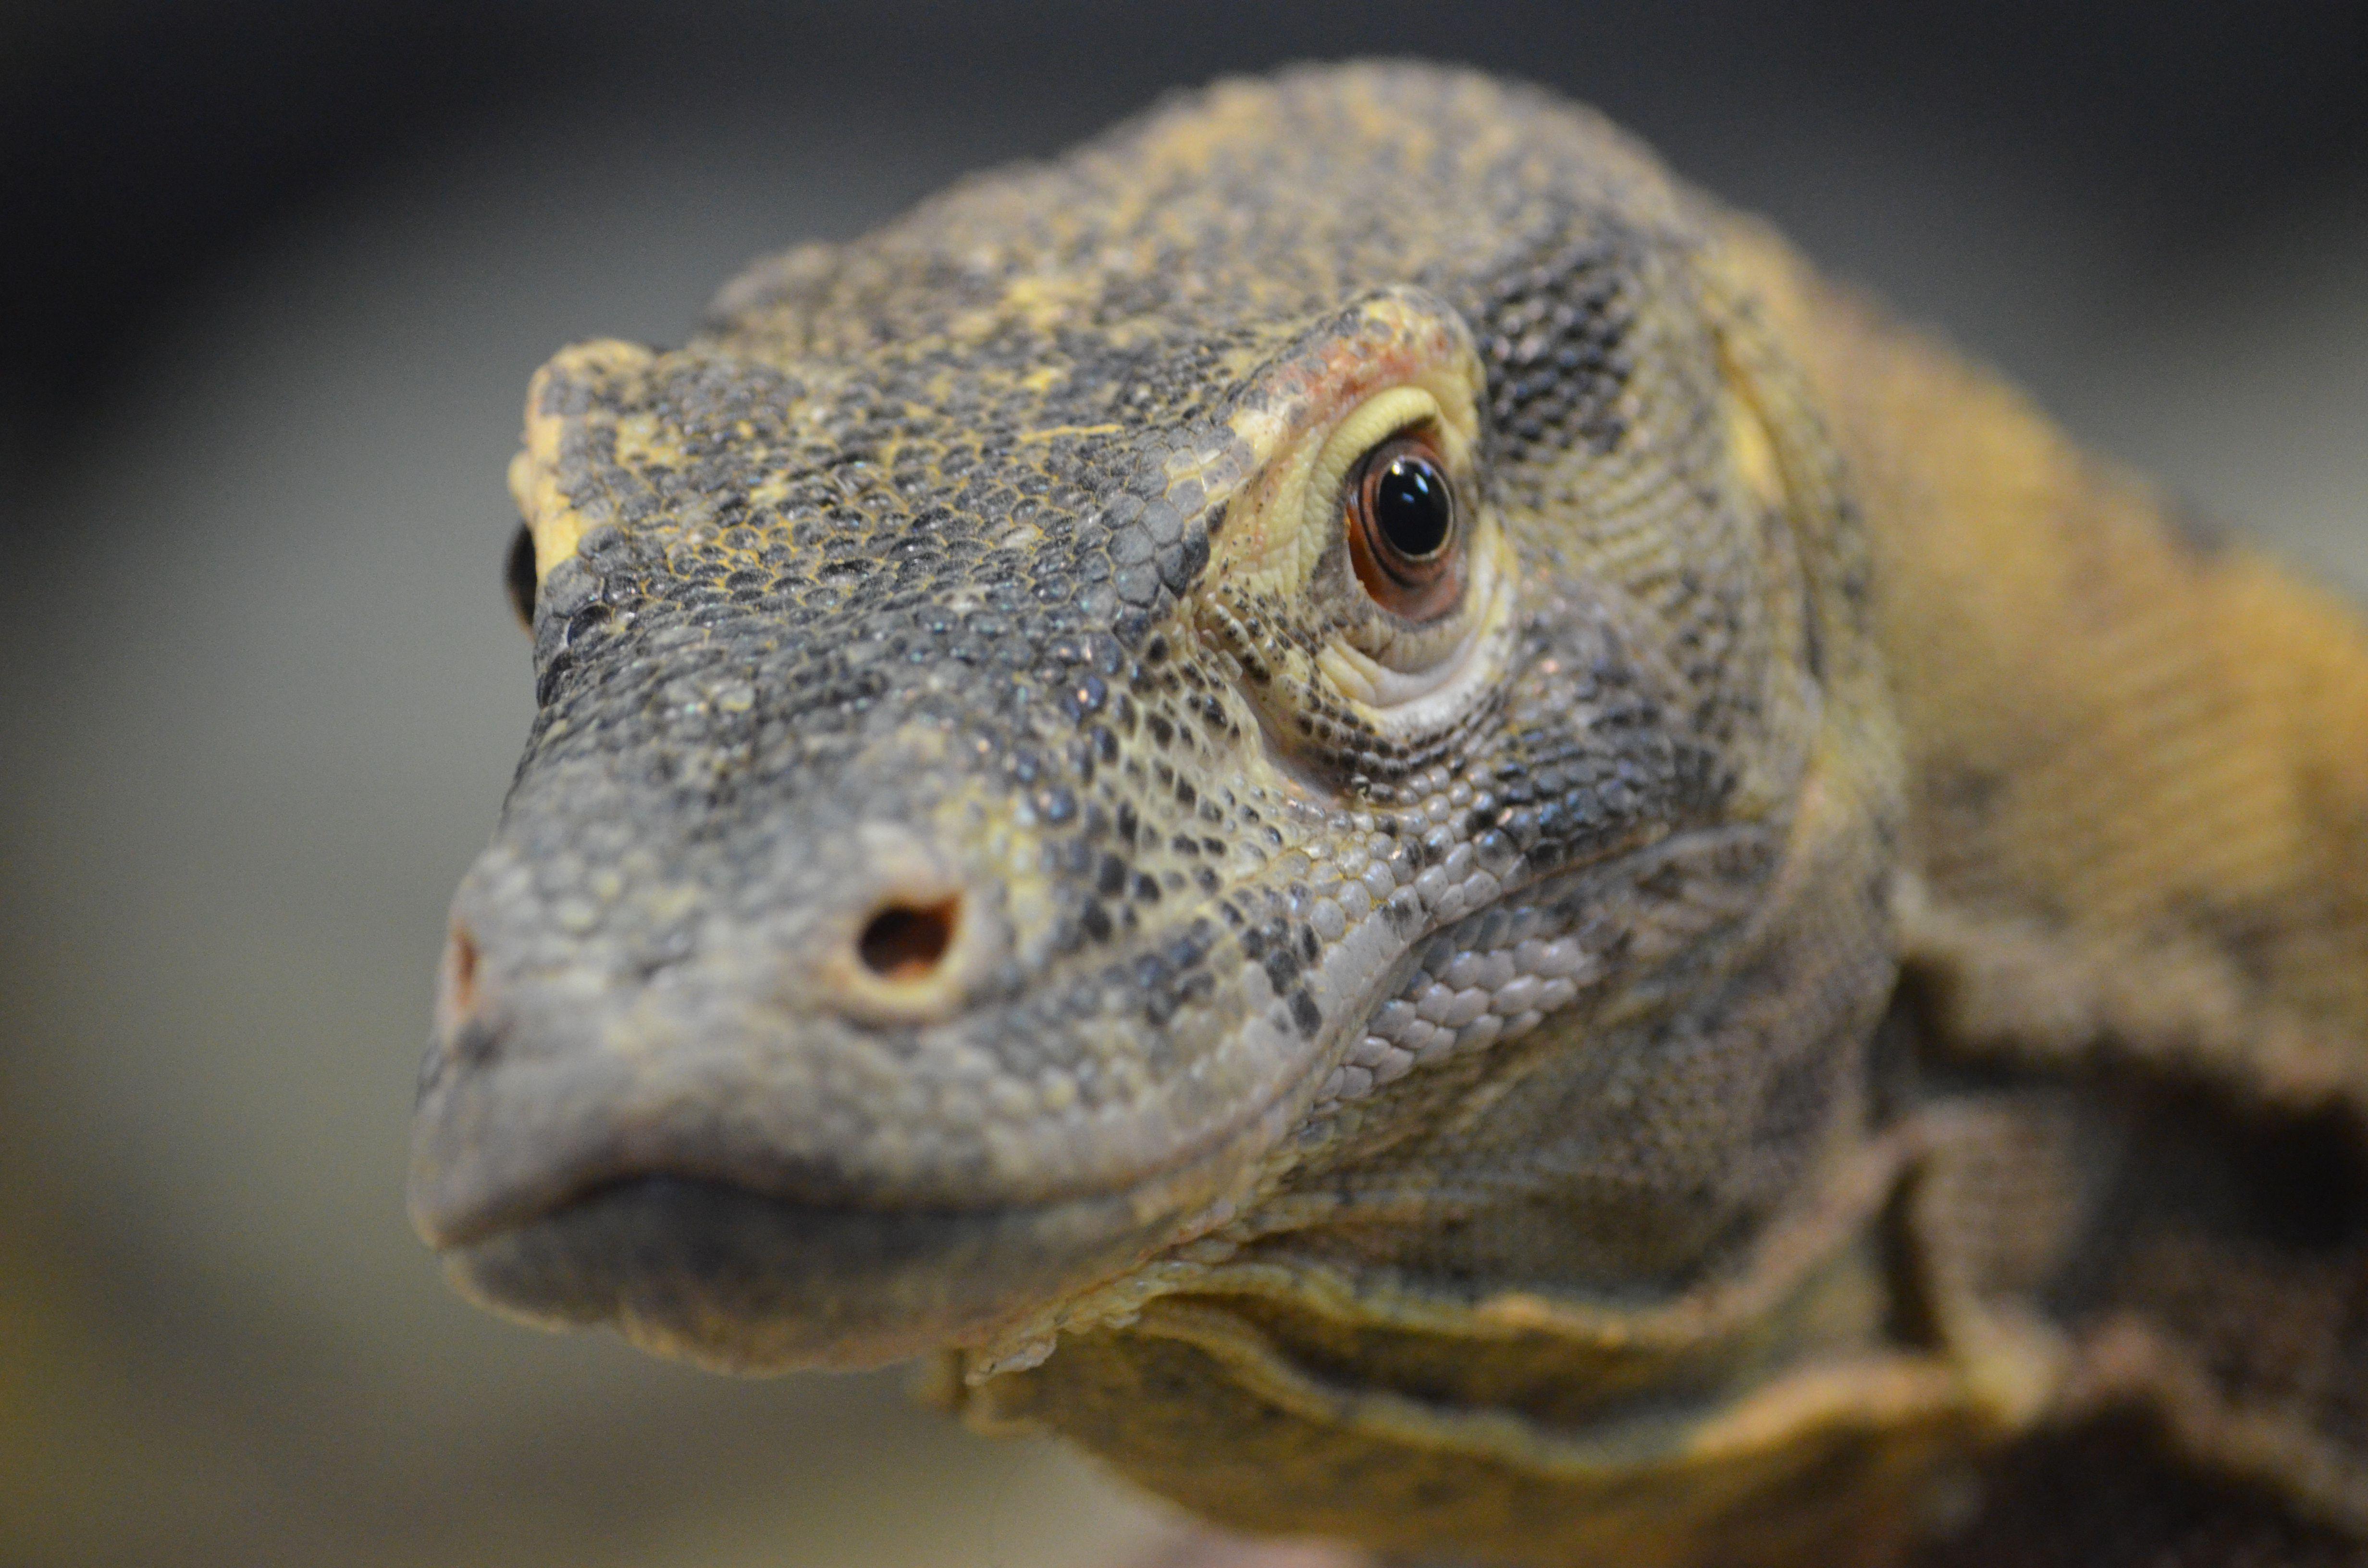 Komodo Dragon Hd